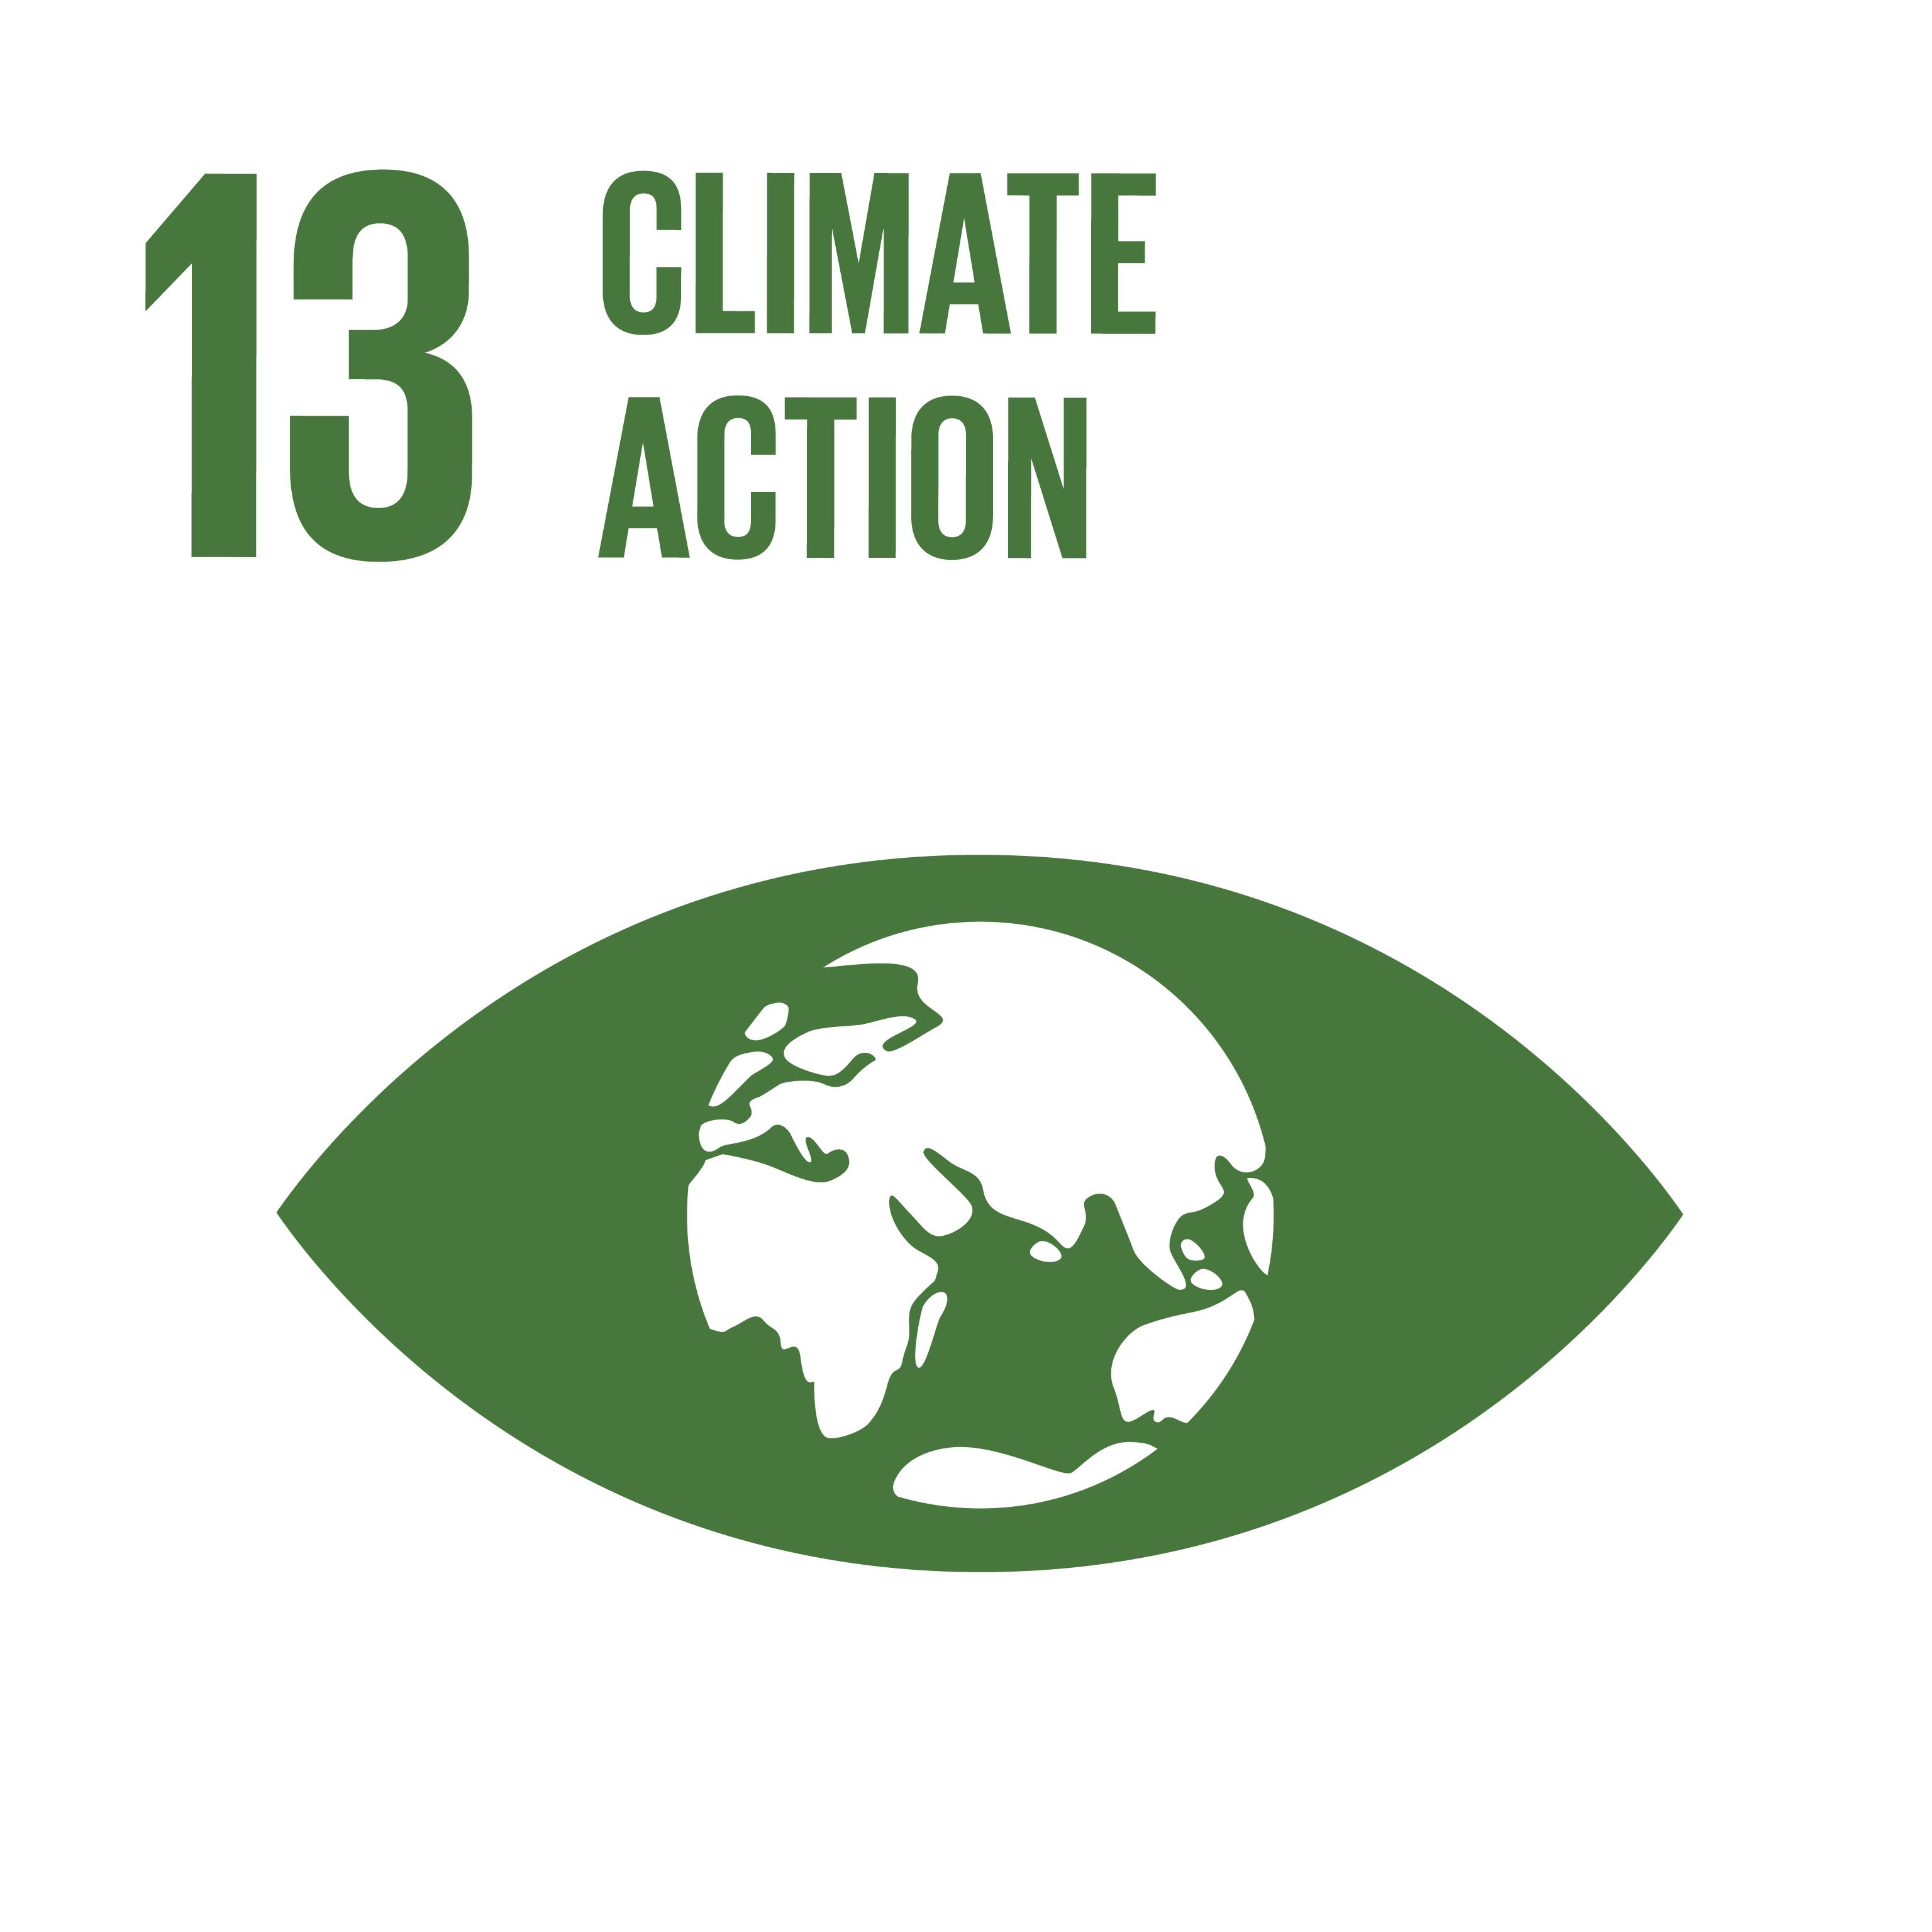 Sustainable Development Goals 13 climate action